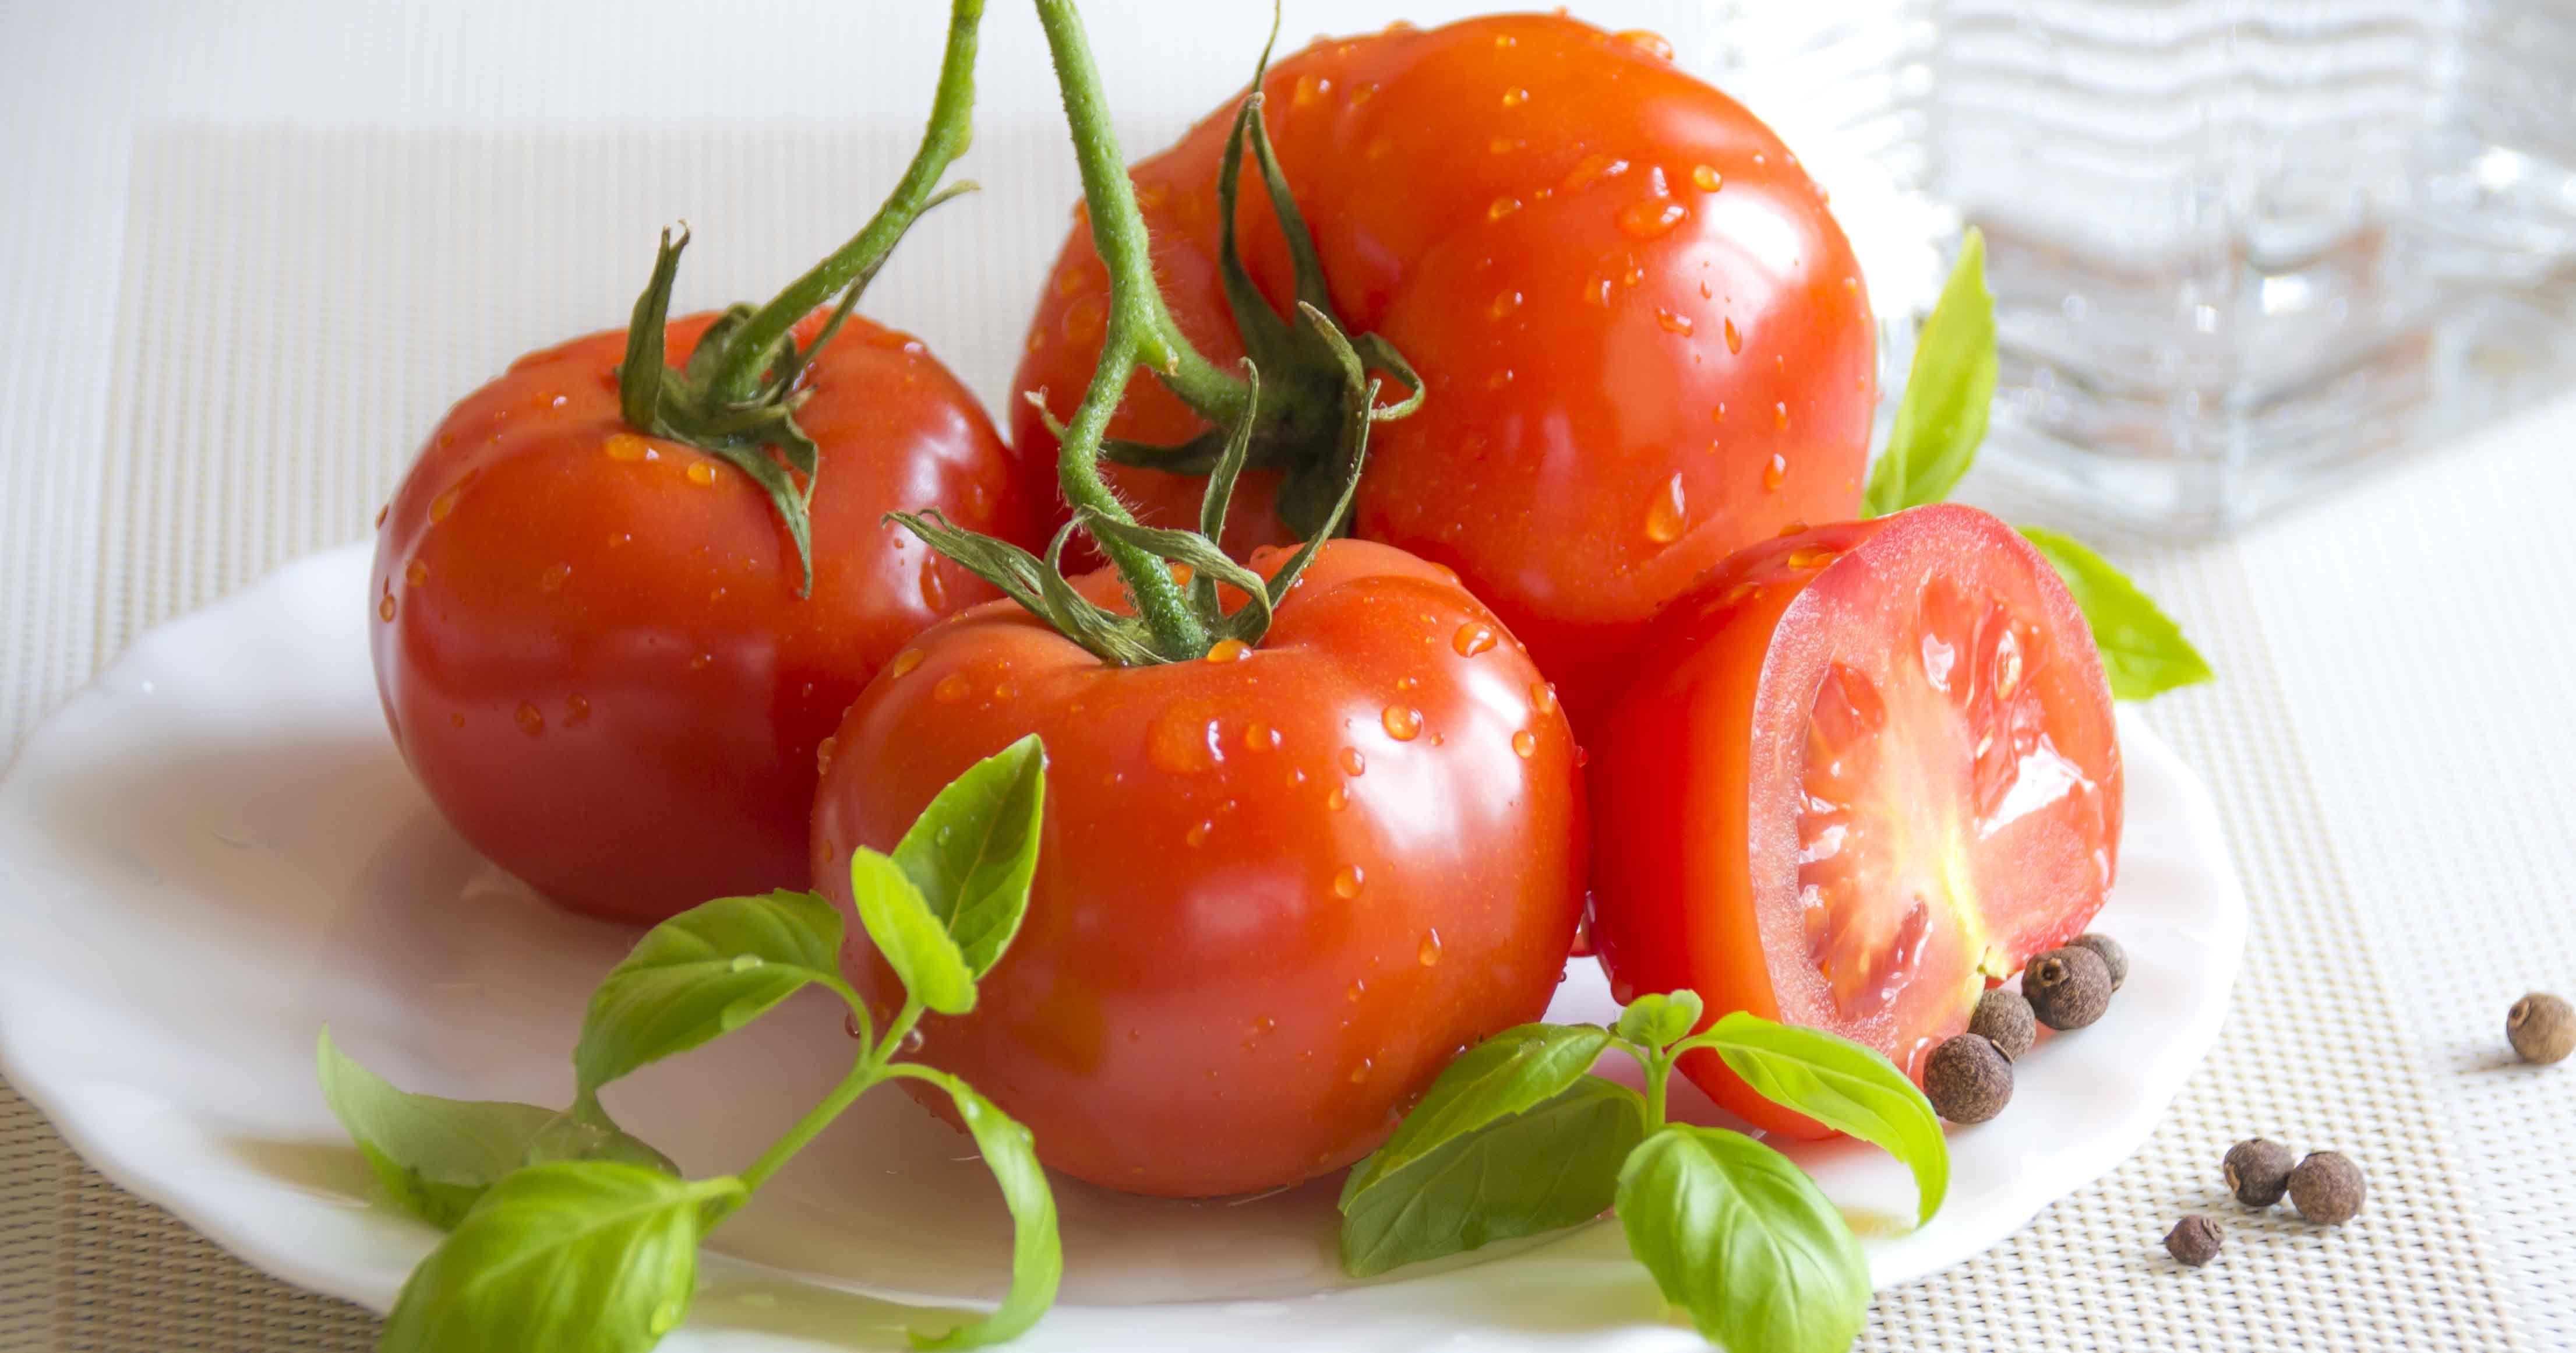 2. Tomat